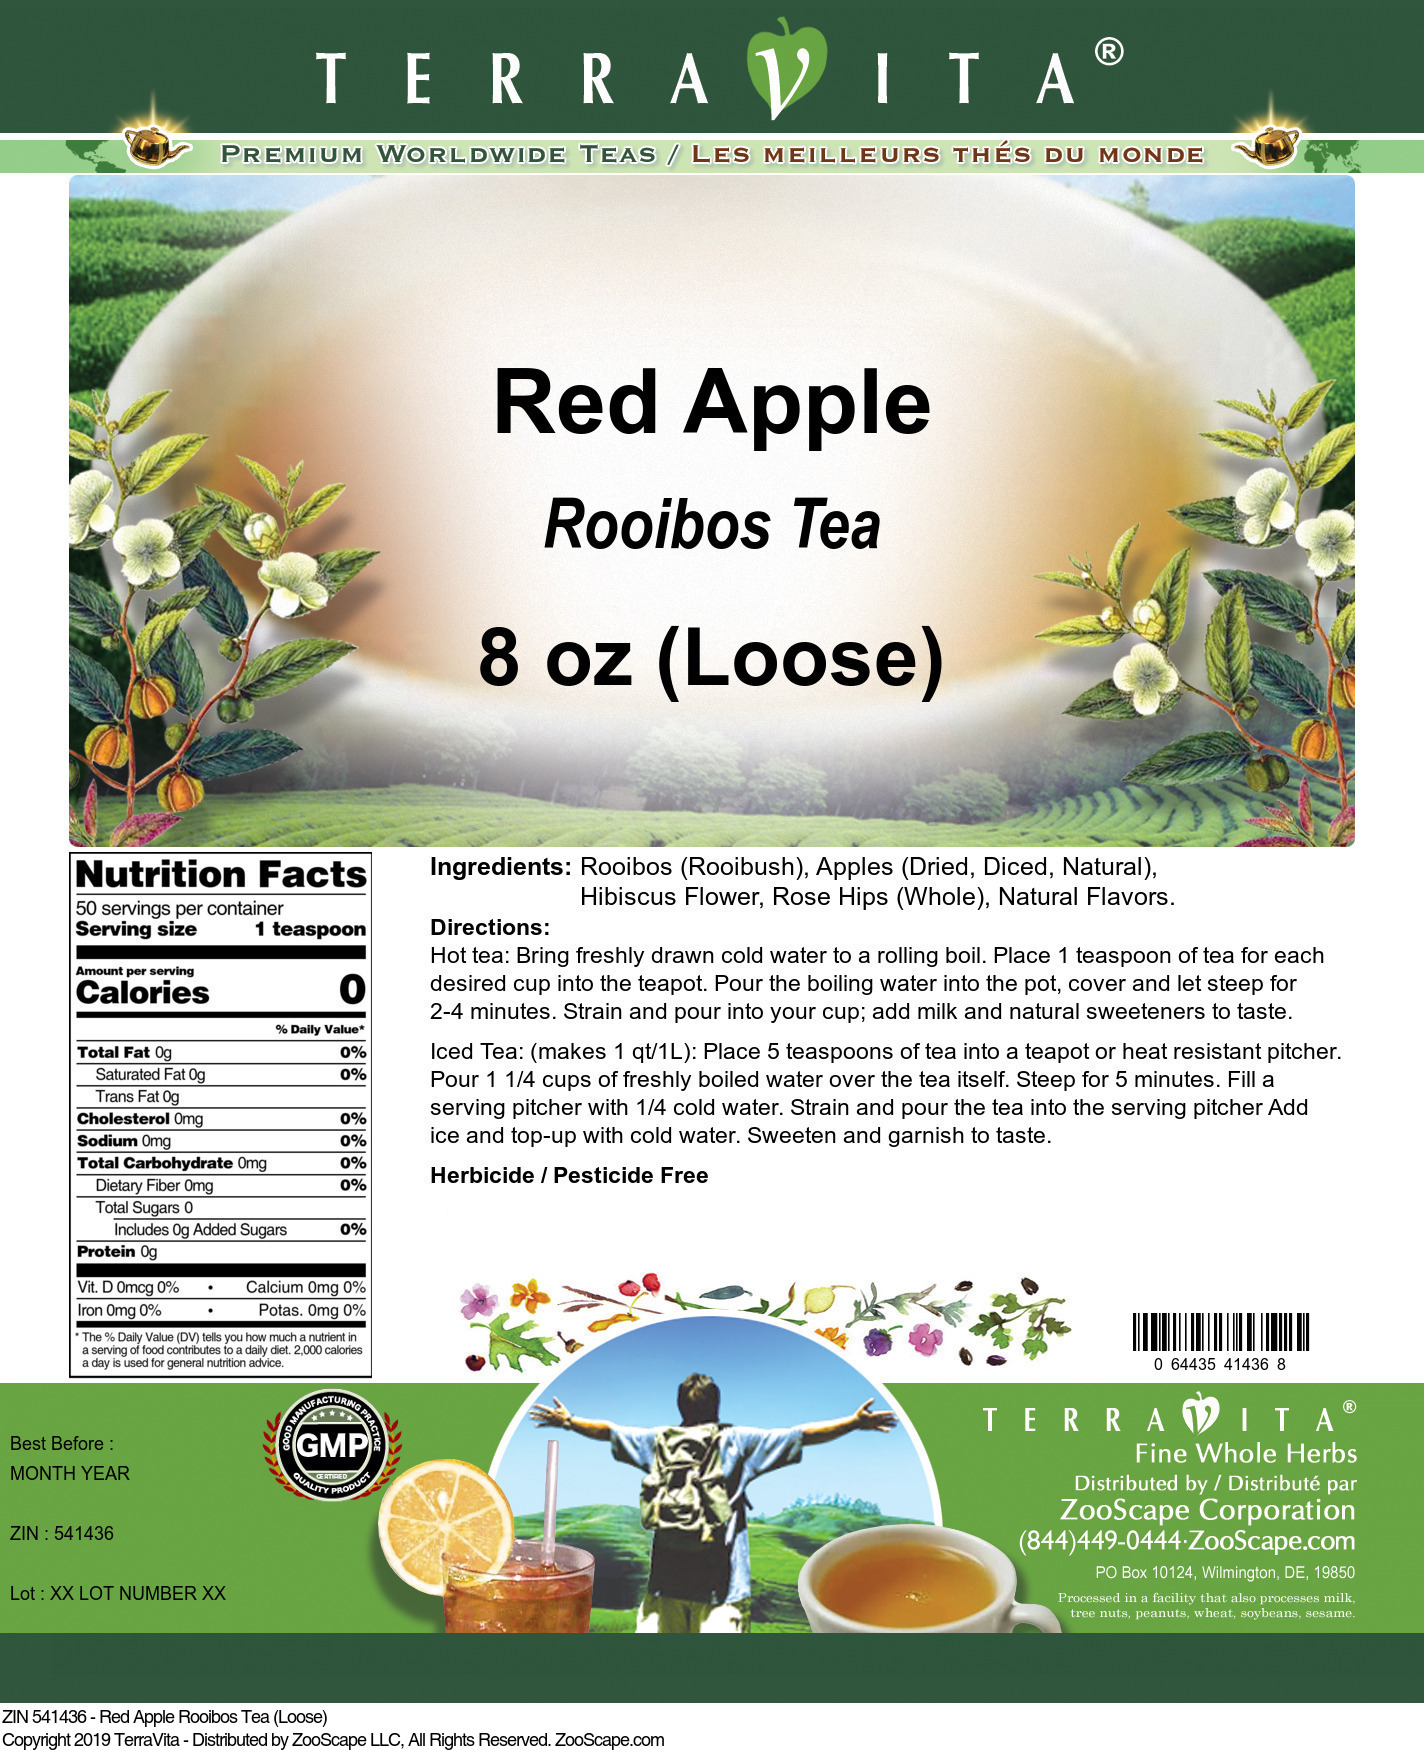 Red Apple Rooibos Tea (Loose)